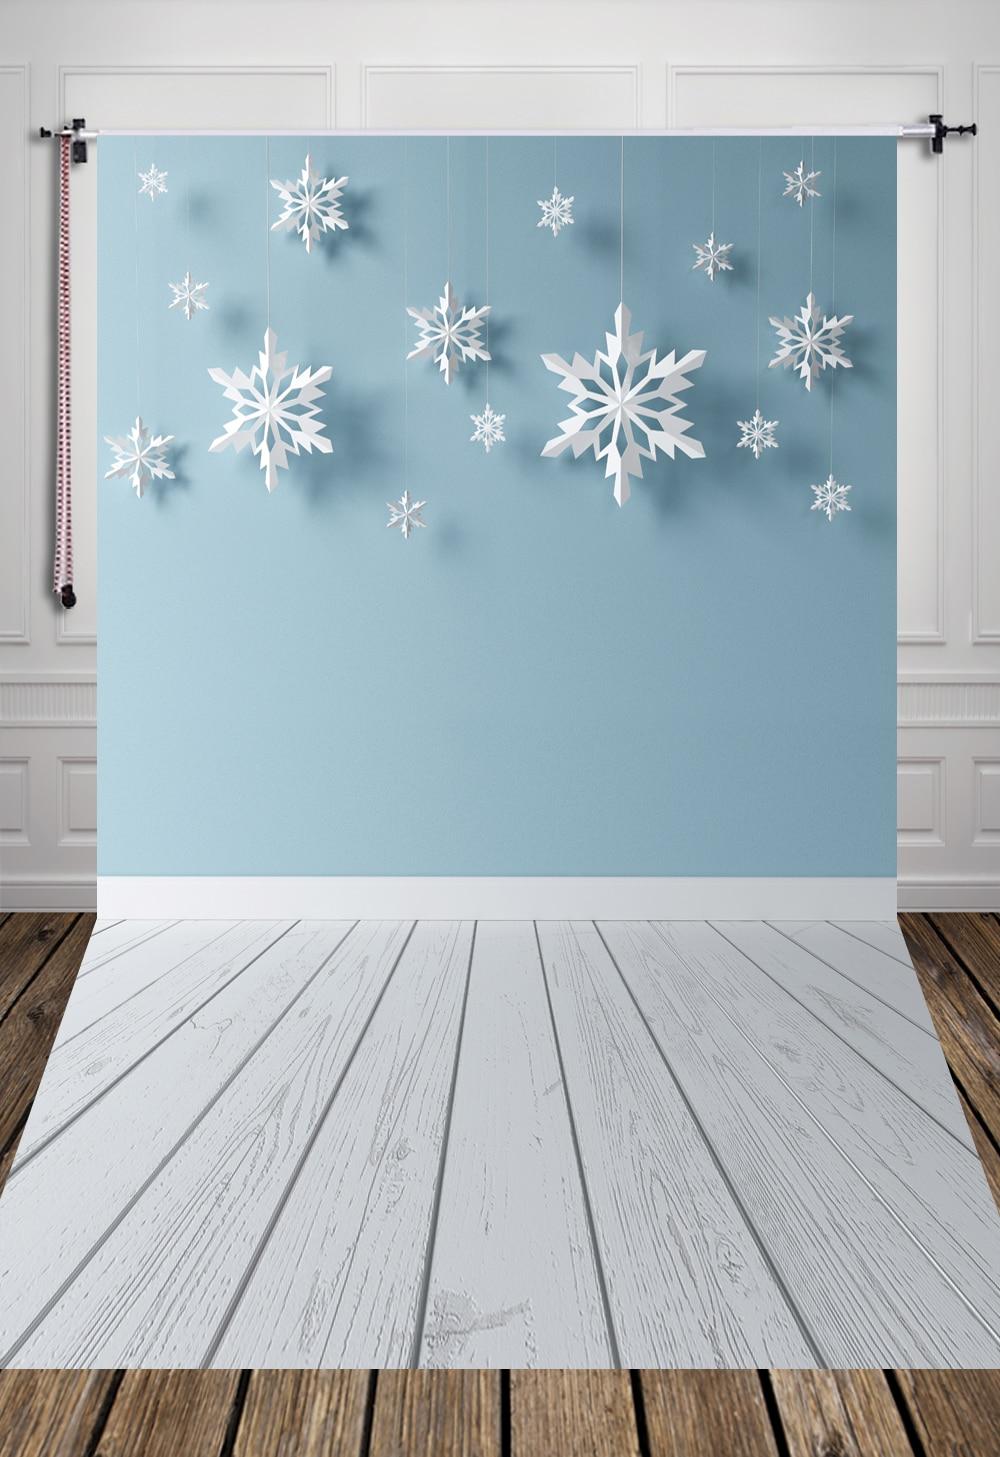 HUAYI snowflake Christmas Photography Photo Backdrop D2394<br><br>Aliexpress